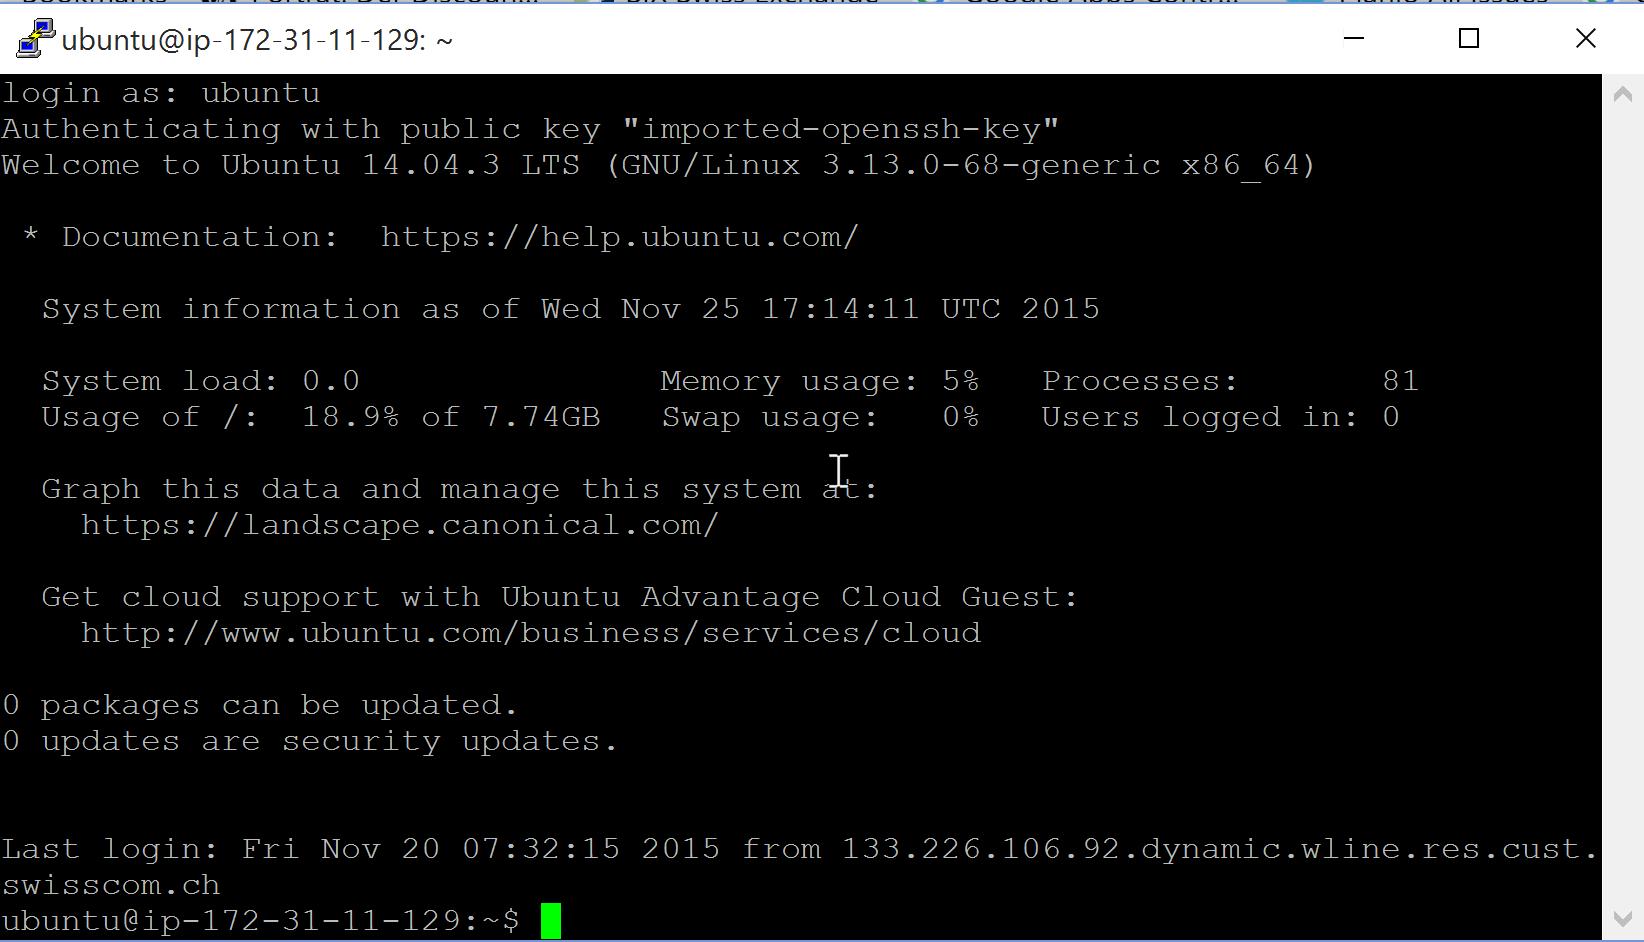 Shiny 2: Installing RStudio Shiny Server on AWS - ipub